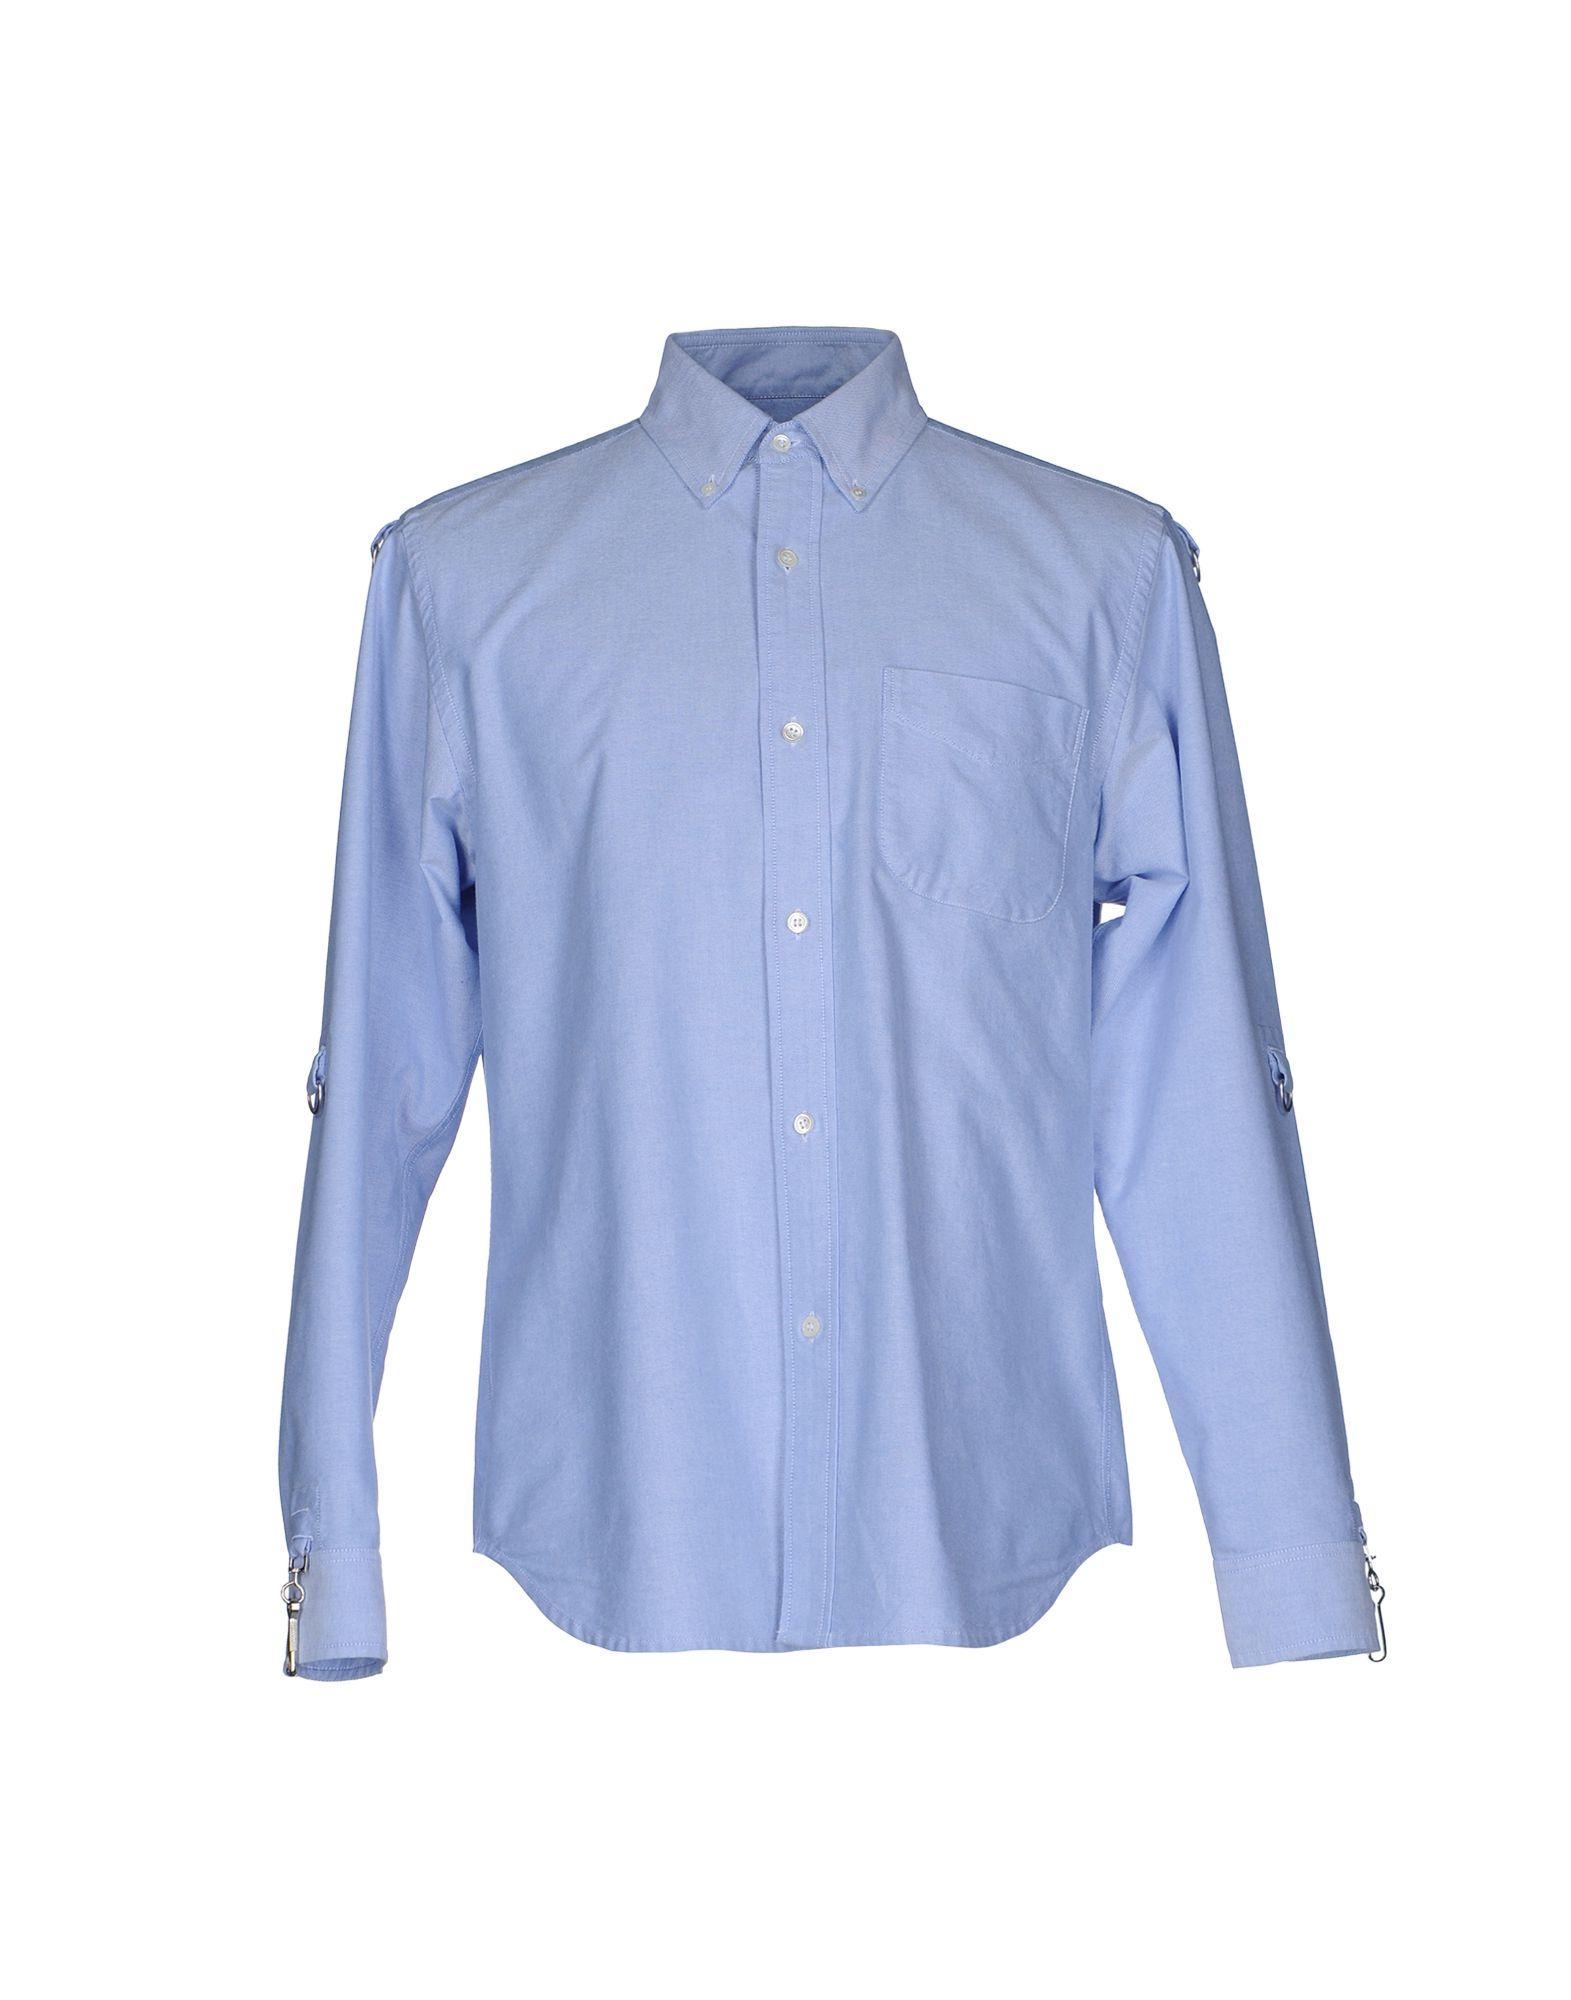 GANRYU Herren Hemd Farbe Himmelblau Größe 6